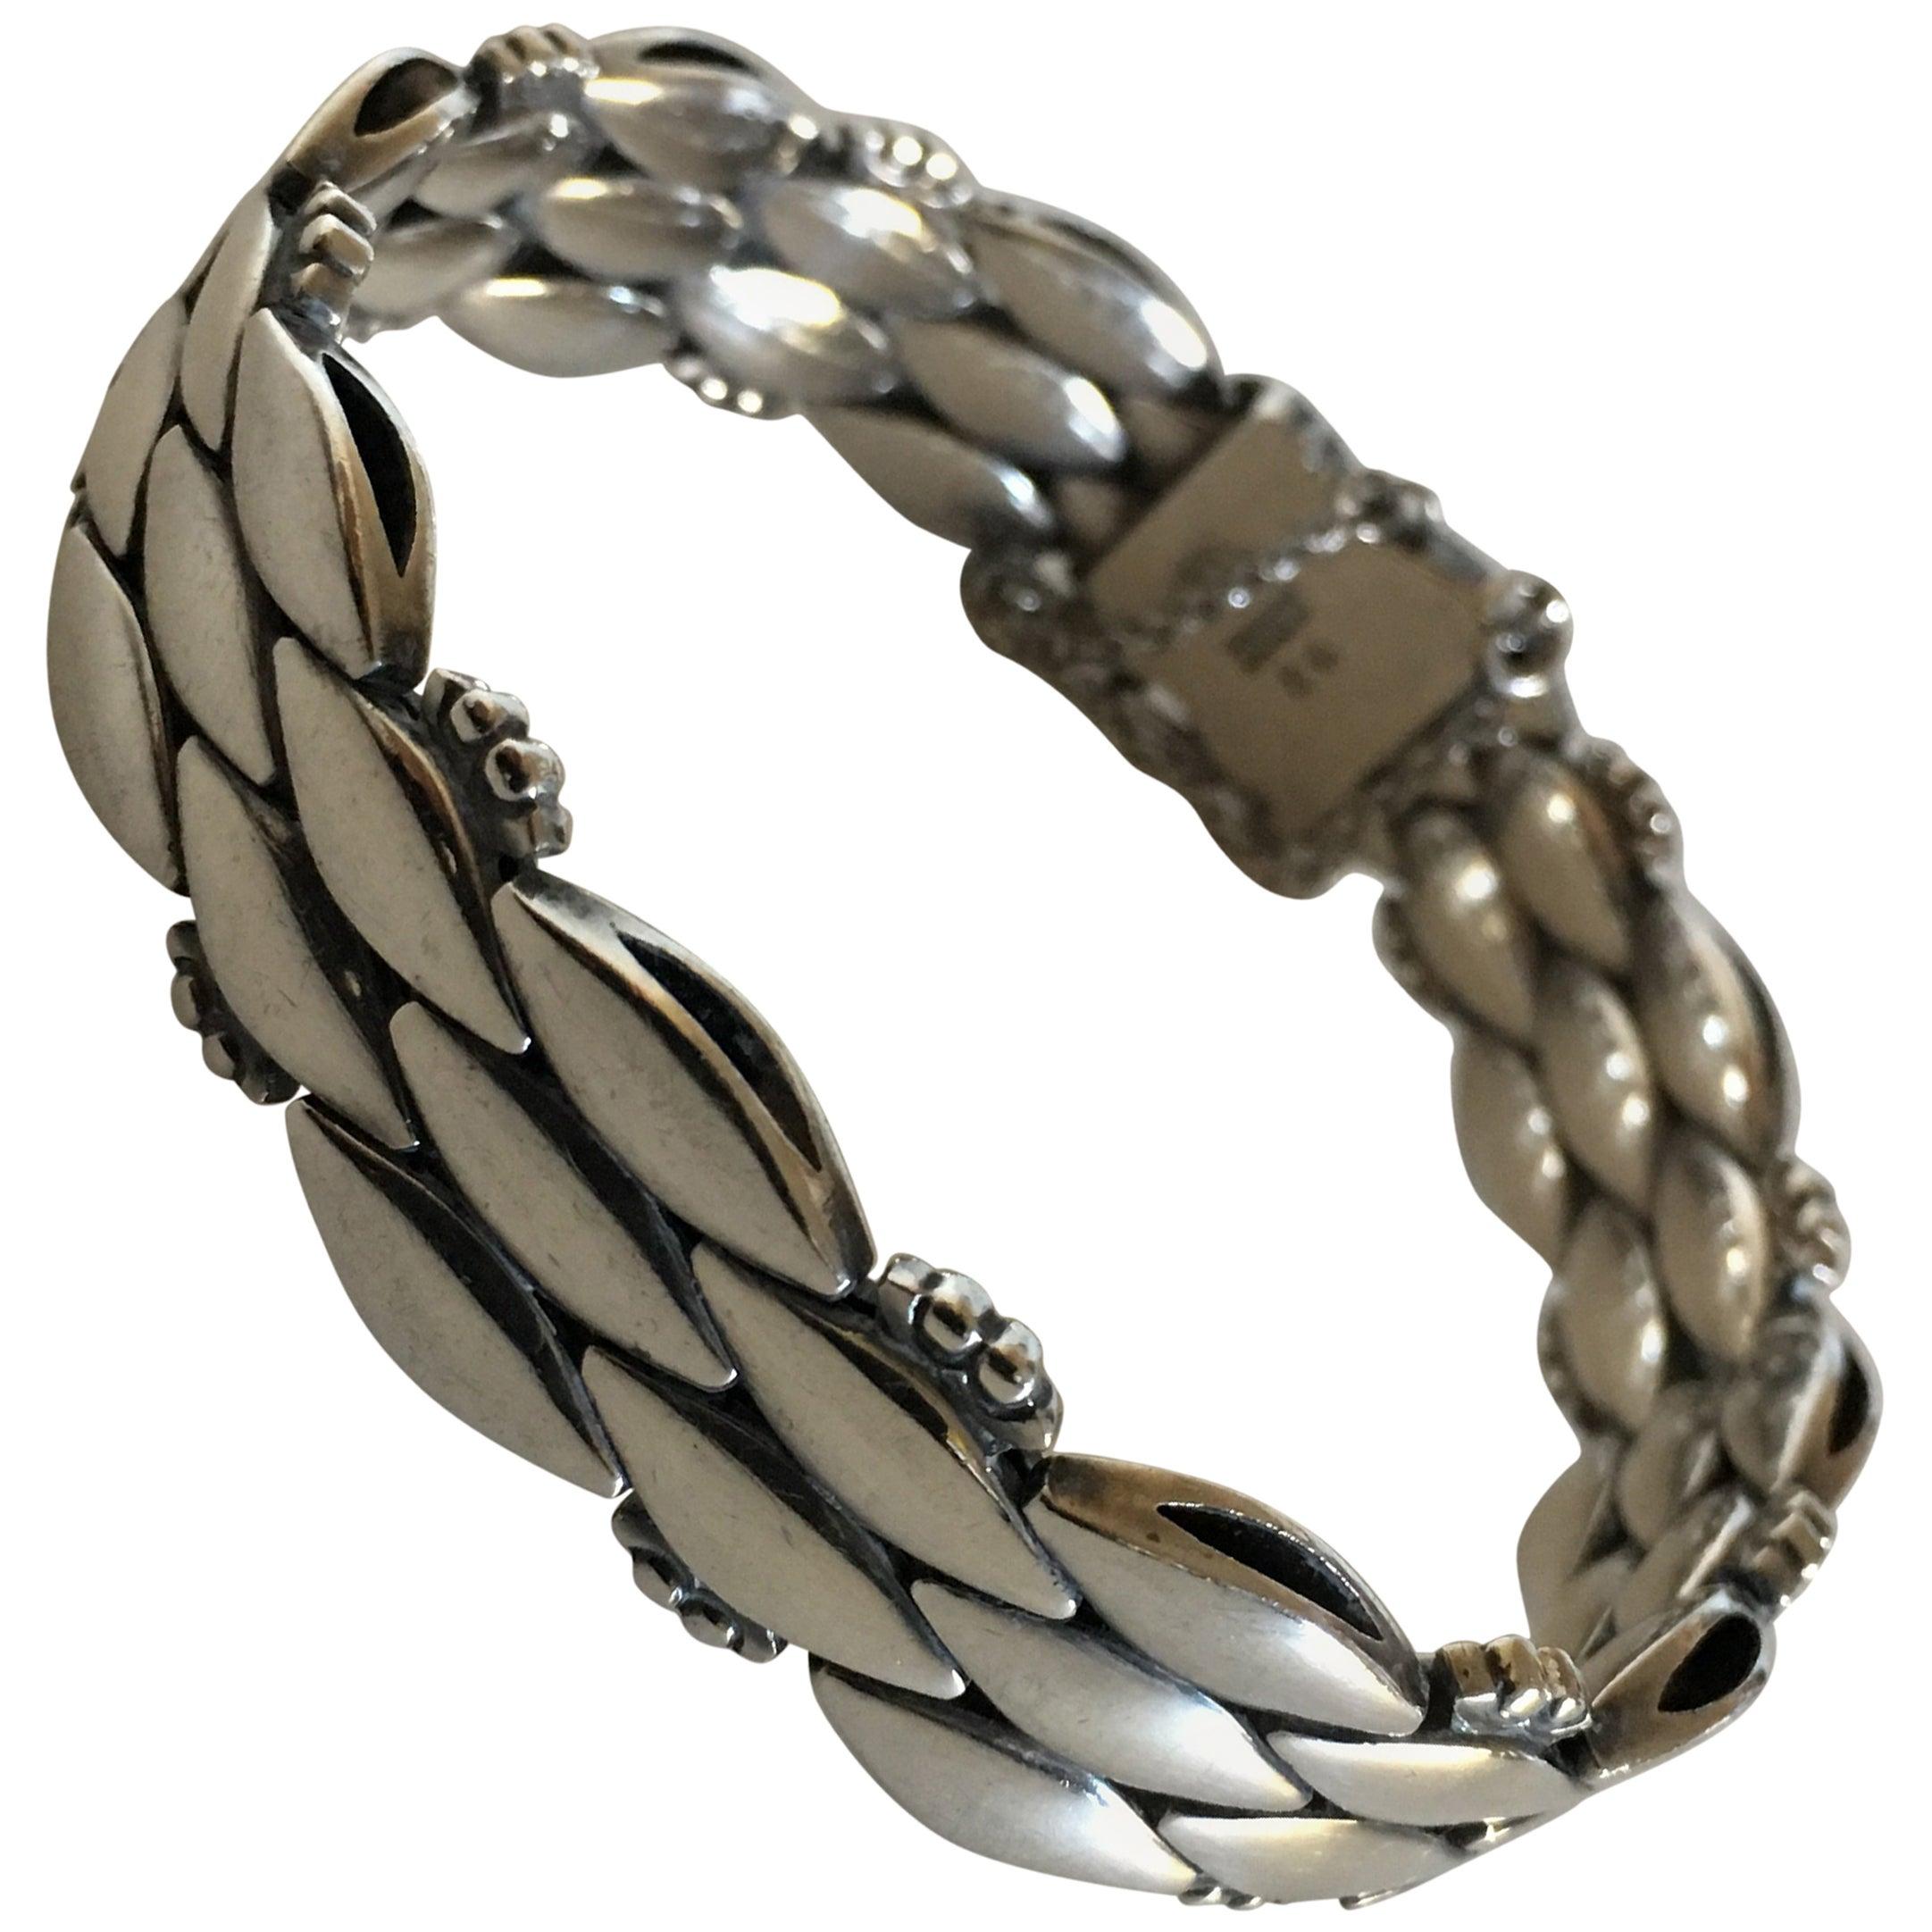 Georg Jensen Sterling Silver Bracelet No. 86